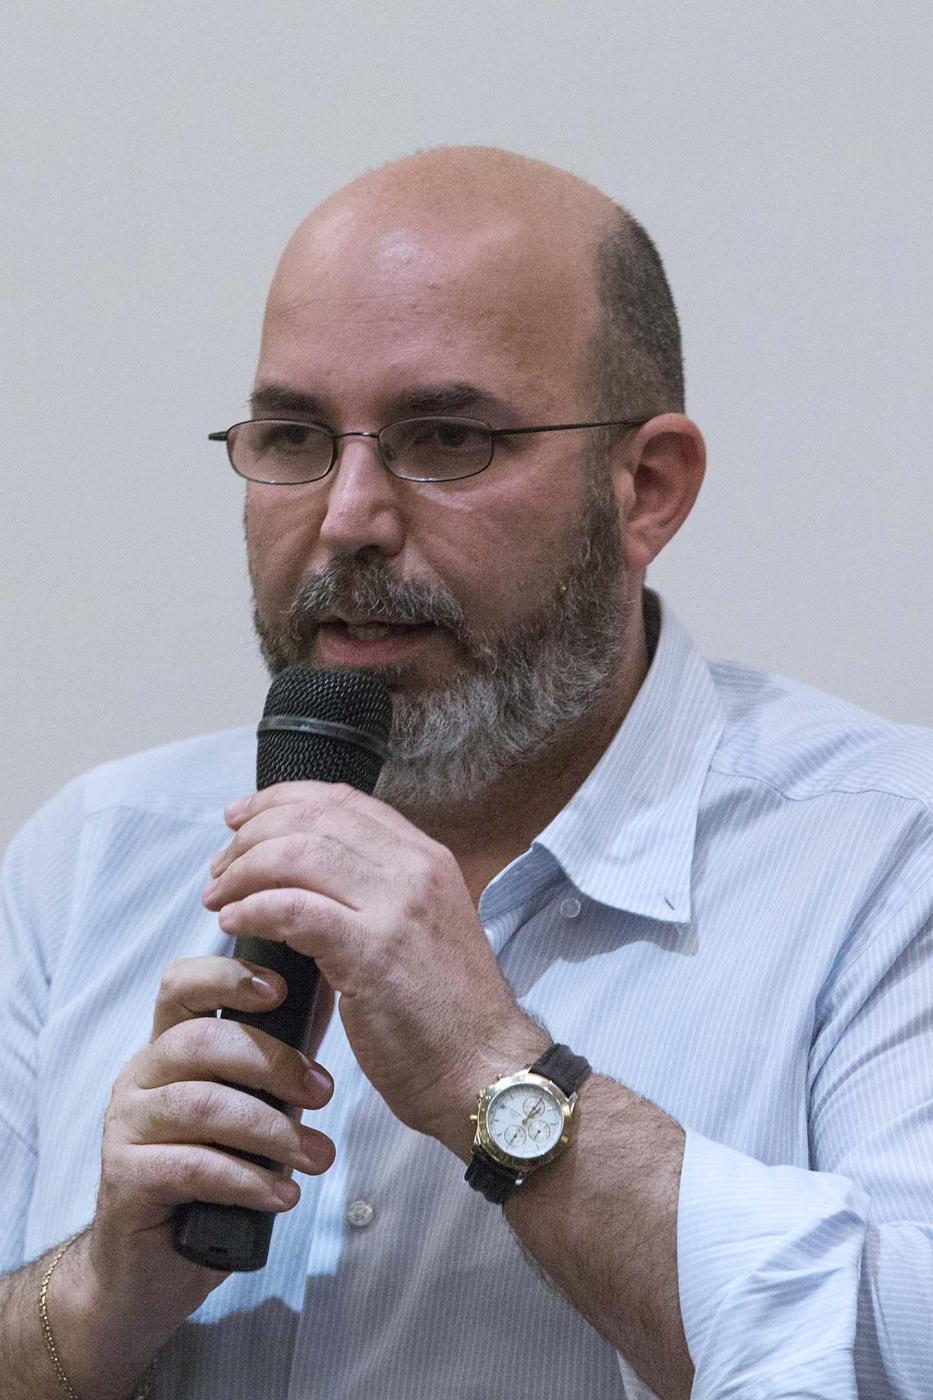 Finance Economics Globus Brokers Banks Collateral Oriano Mattei